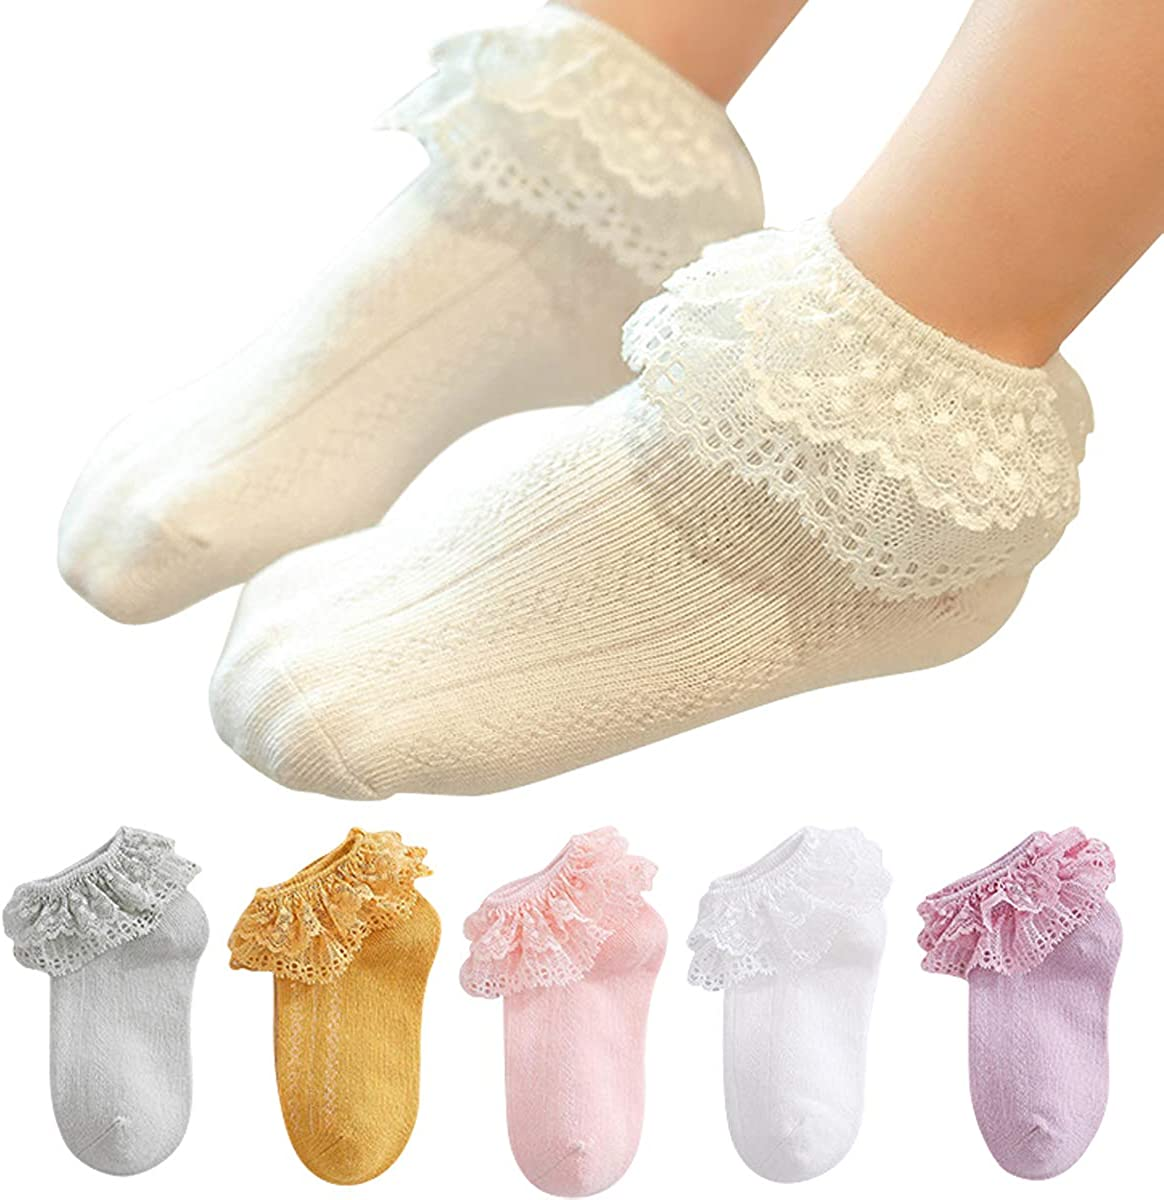 vanberfia Summer Ruffles Lace Frilly Socks for Newborn Infant Toddler Baby Girls